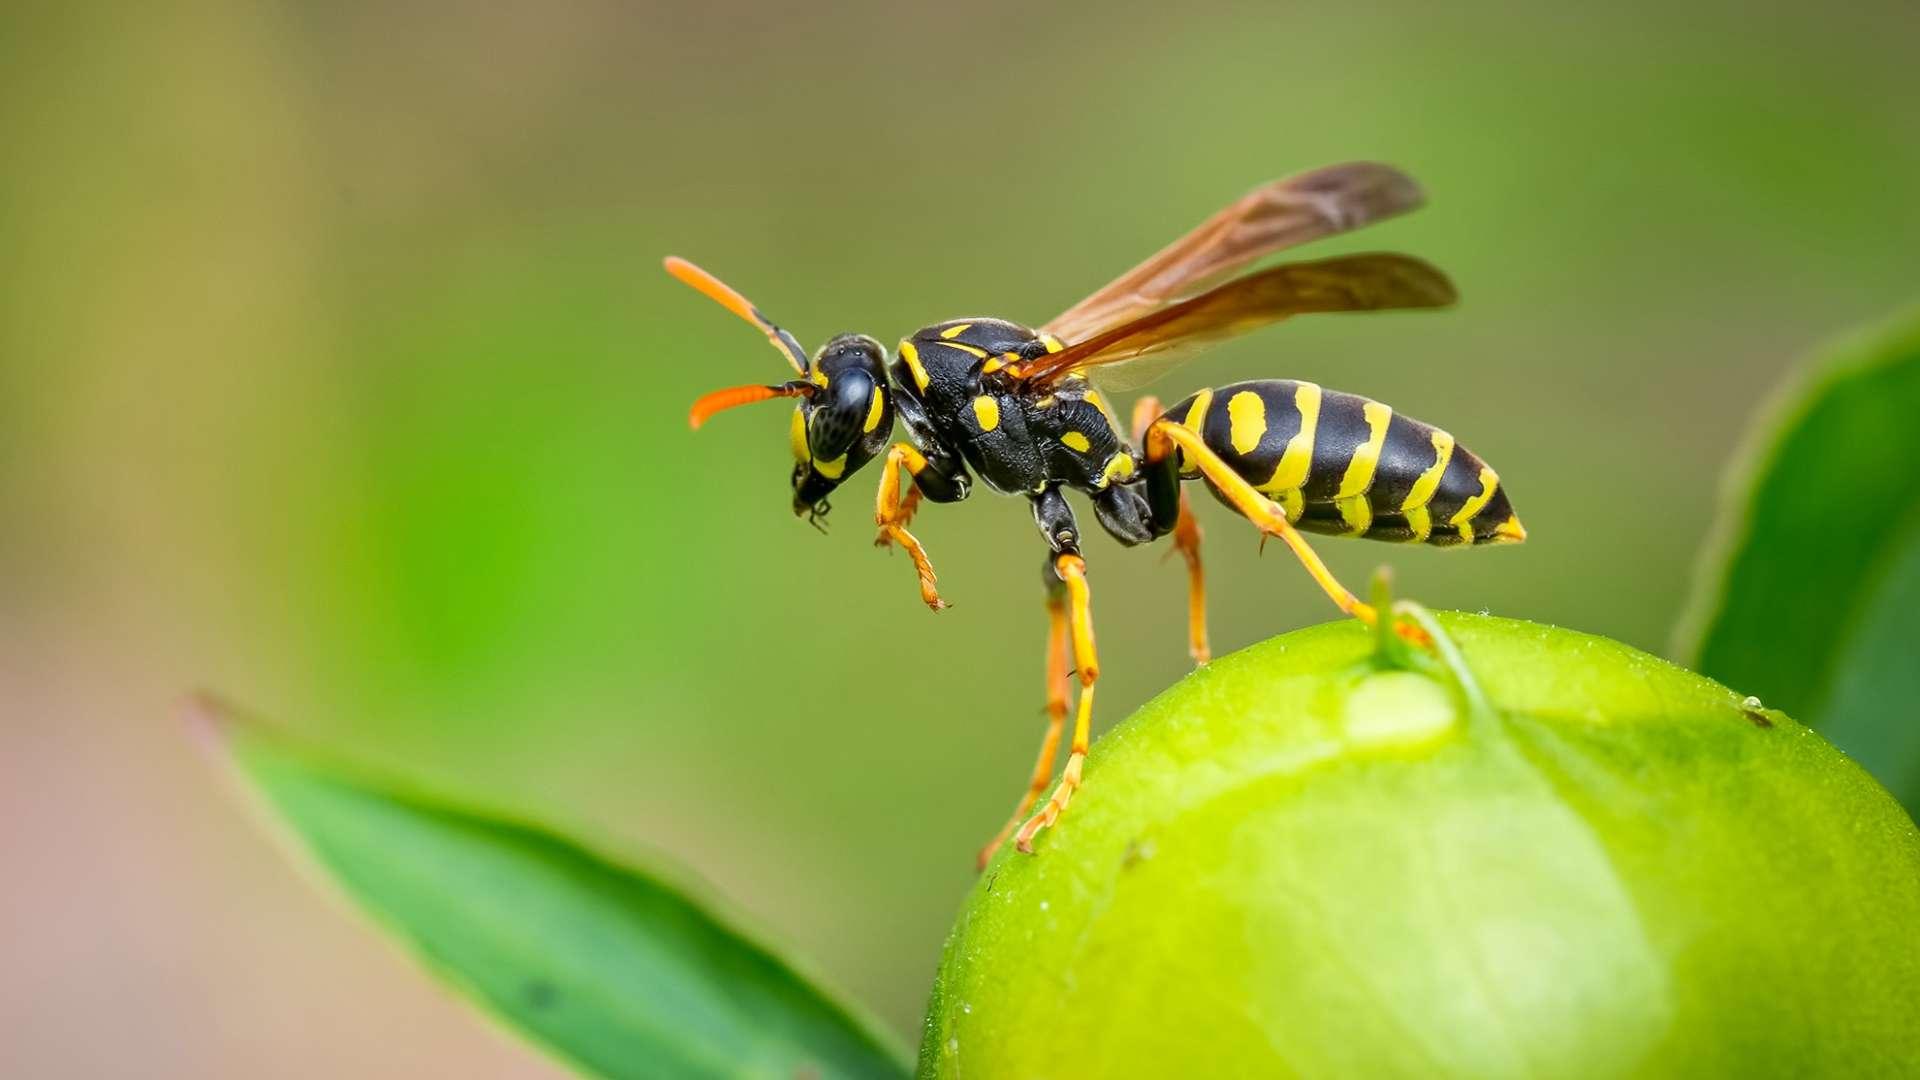 flugbereite Wespe - Wespenallergie